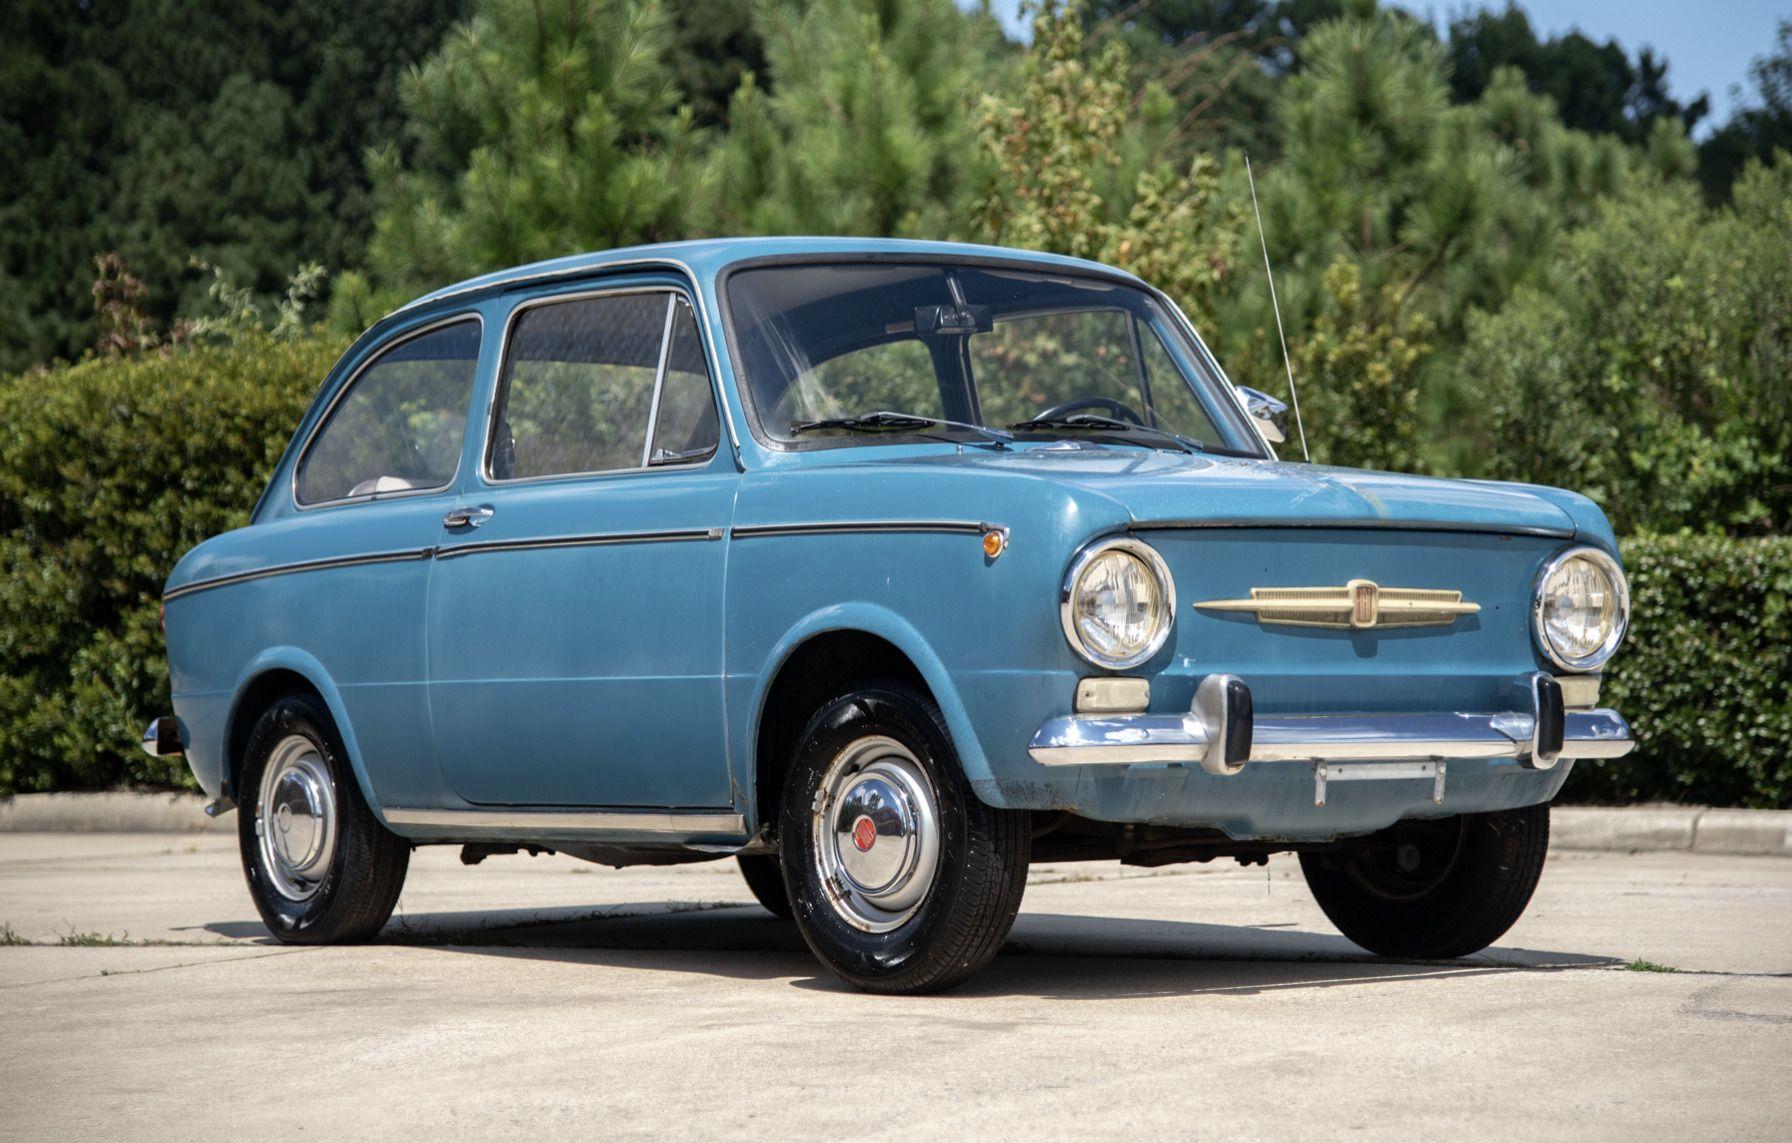 1967 Fiat 850 Vecchie Auto Auto Automobile